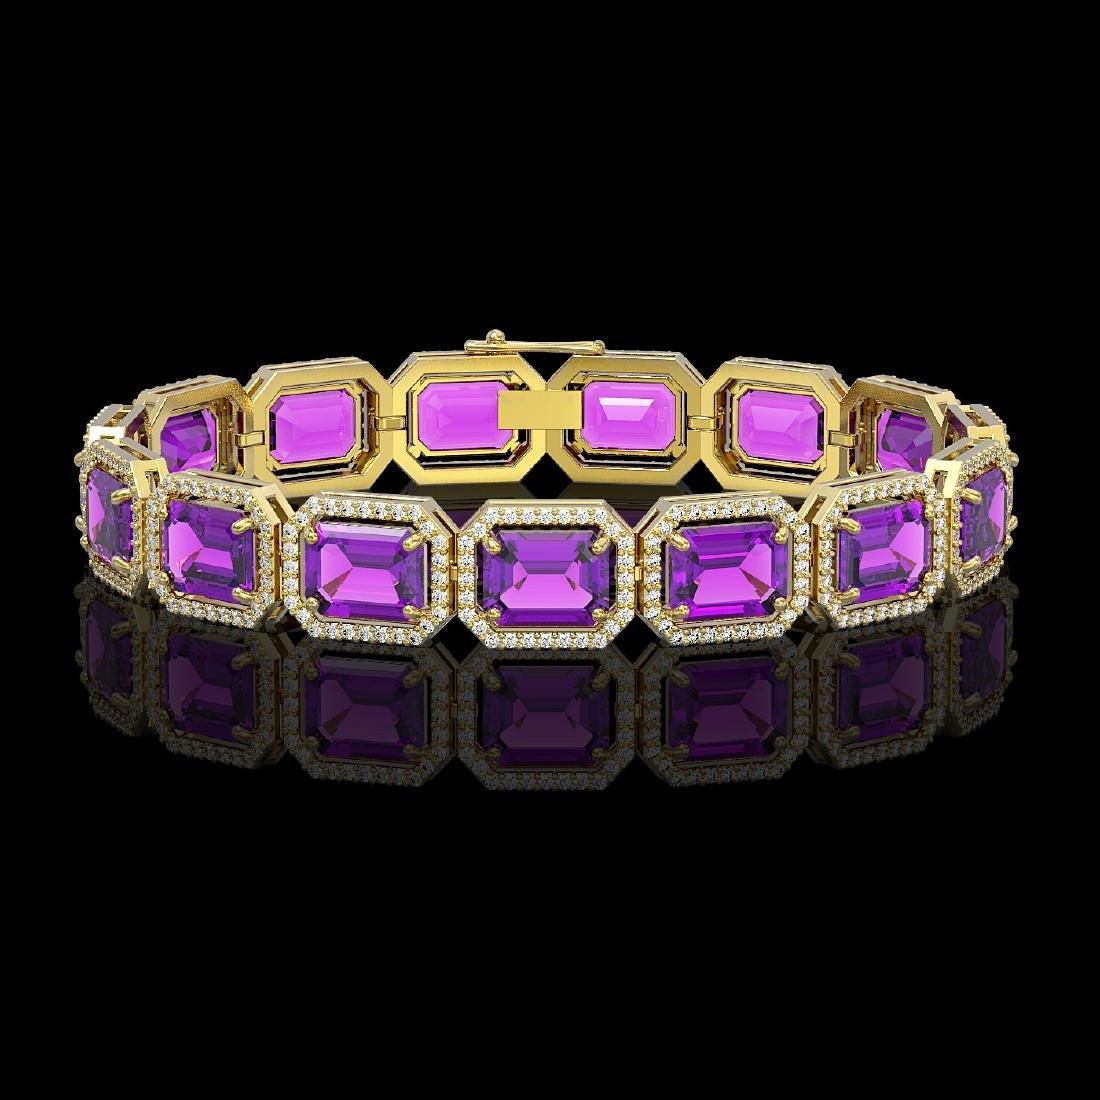 34.86 CTW Amethyst & Diamond Halo Bracelet 10K Yellow